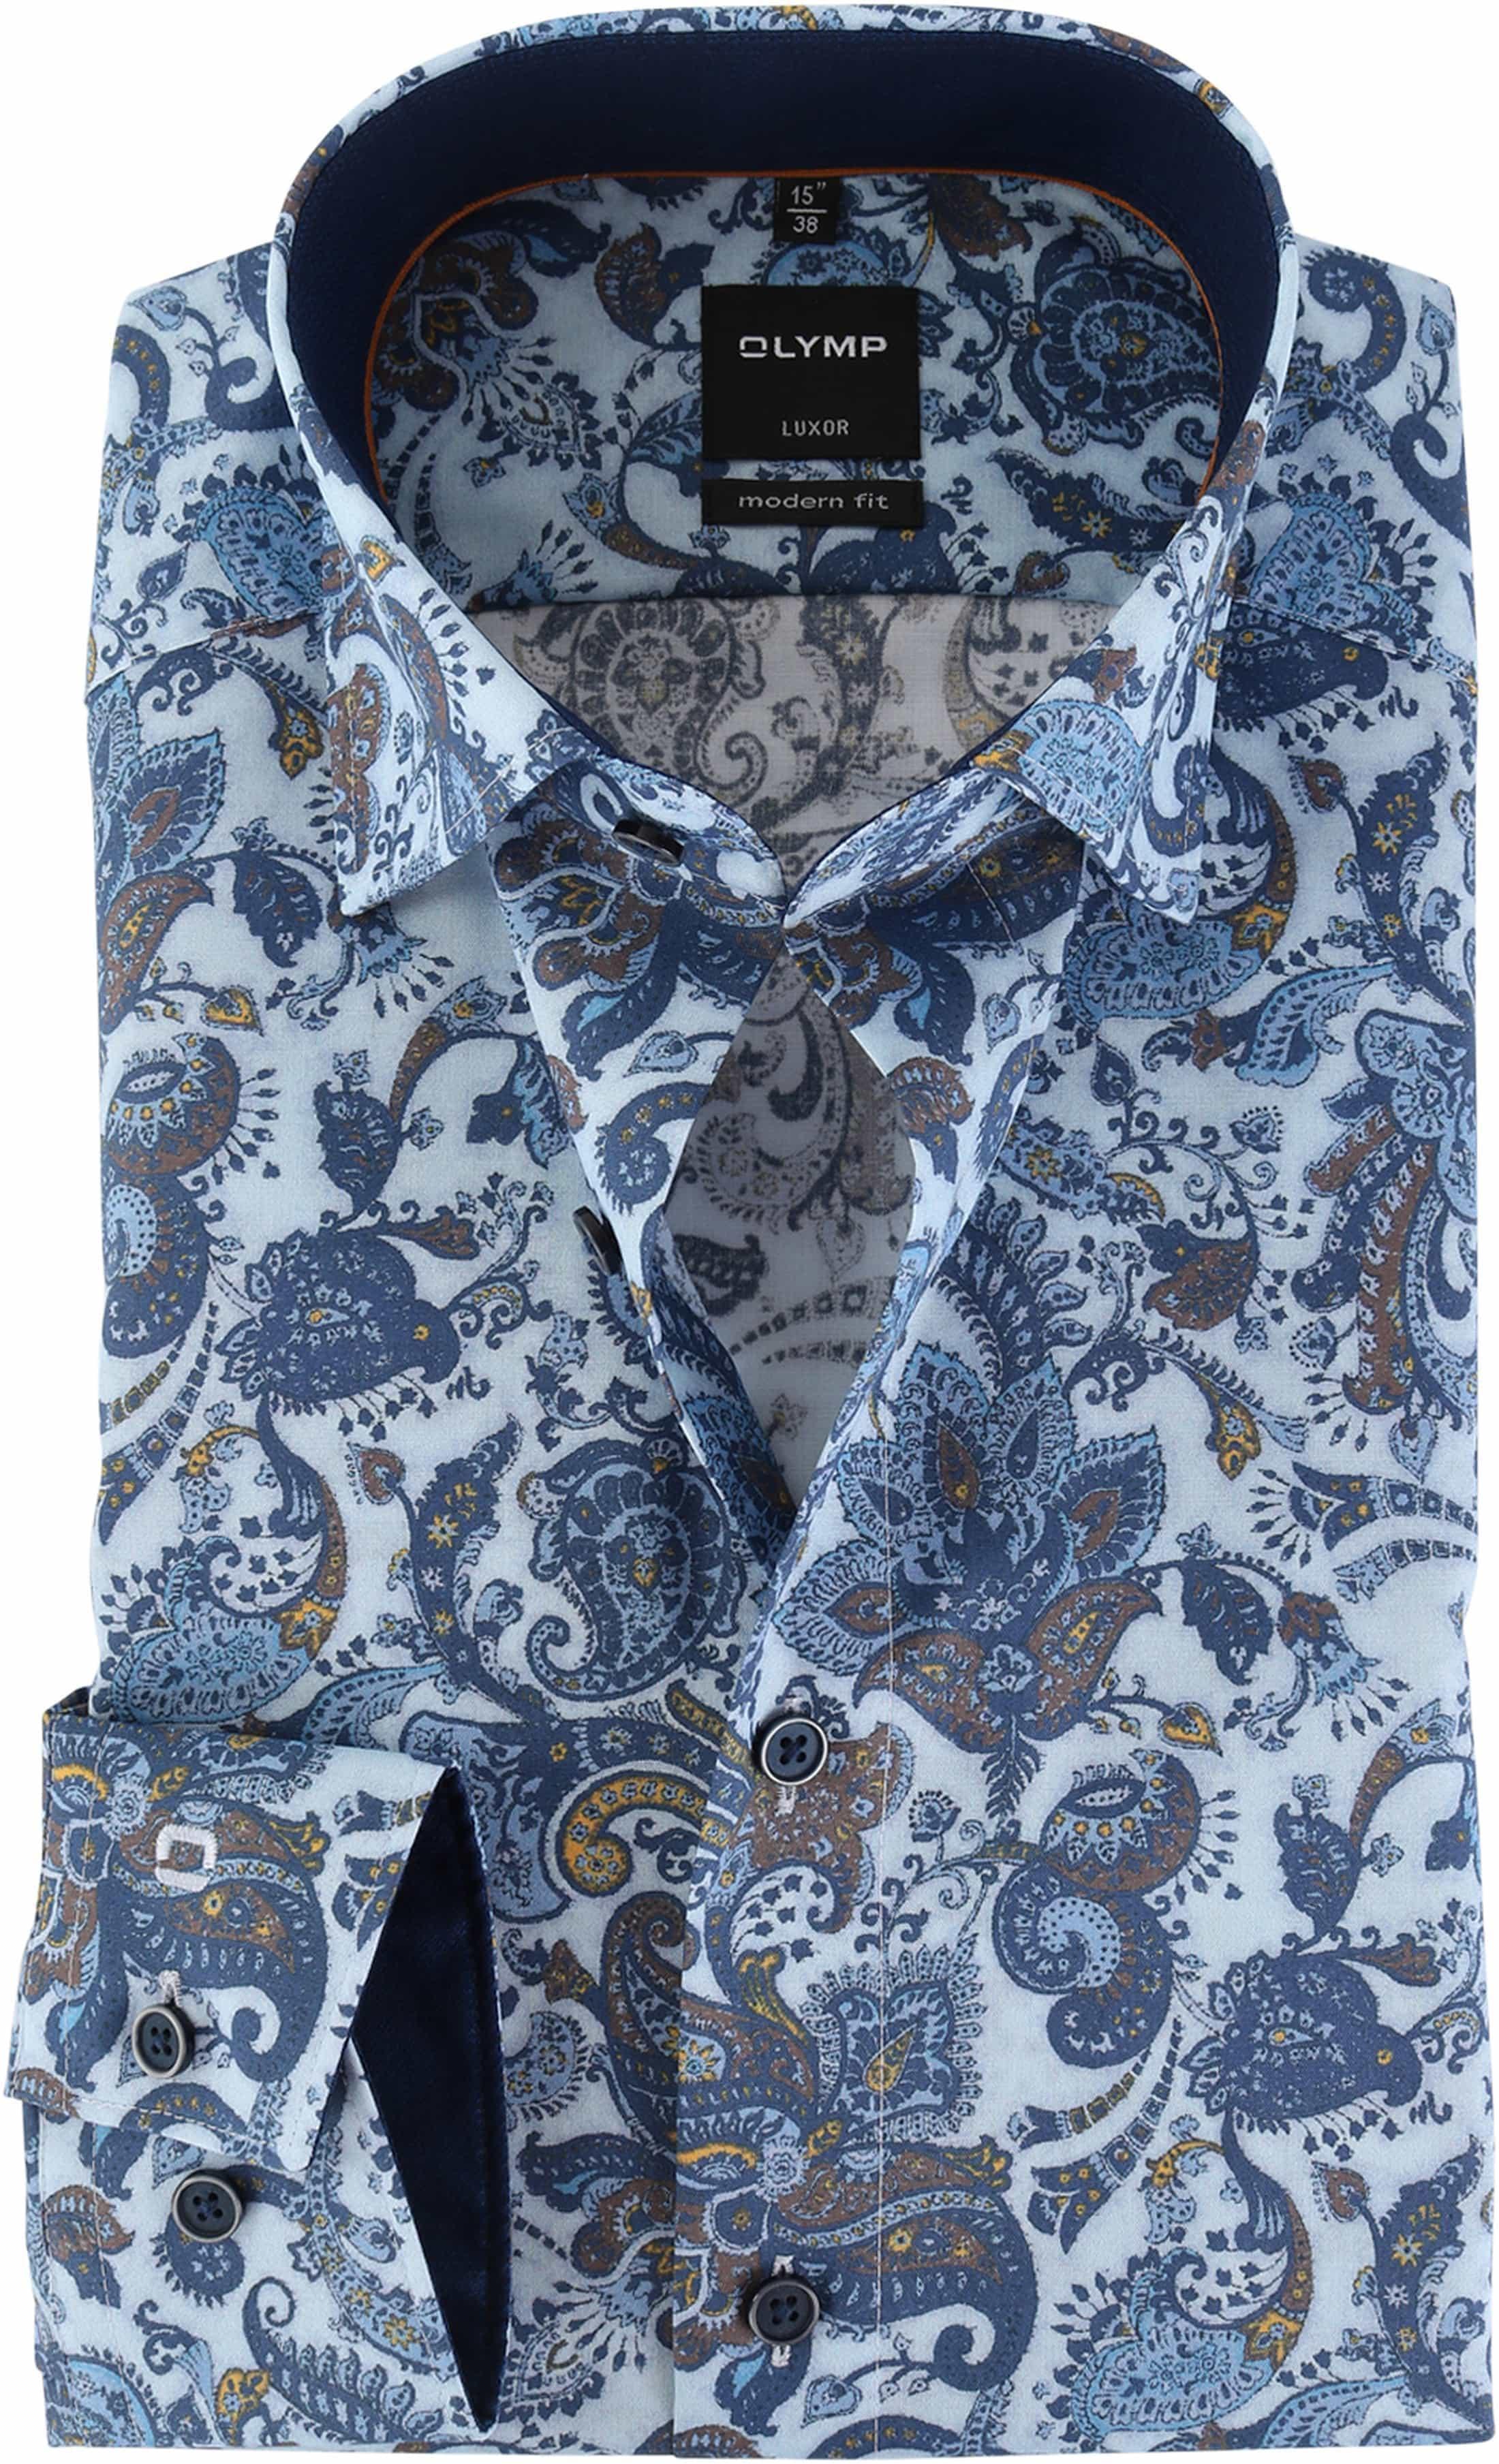 Luxor Online Modern Strijkvrij Fit Paisley 120684 Olymp Overhemd WD2IYbH9eE